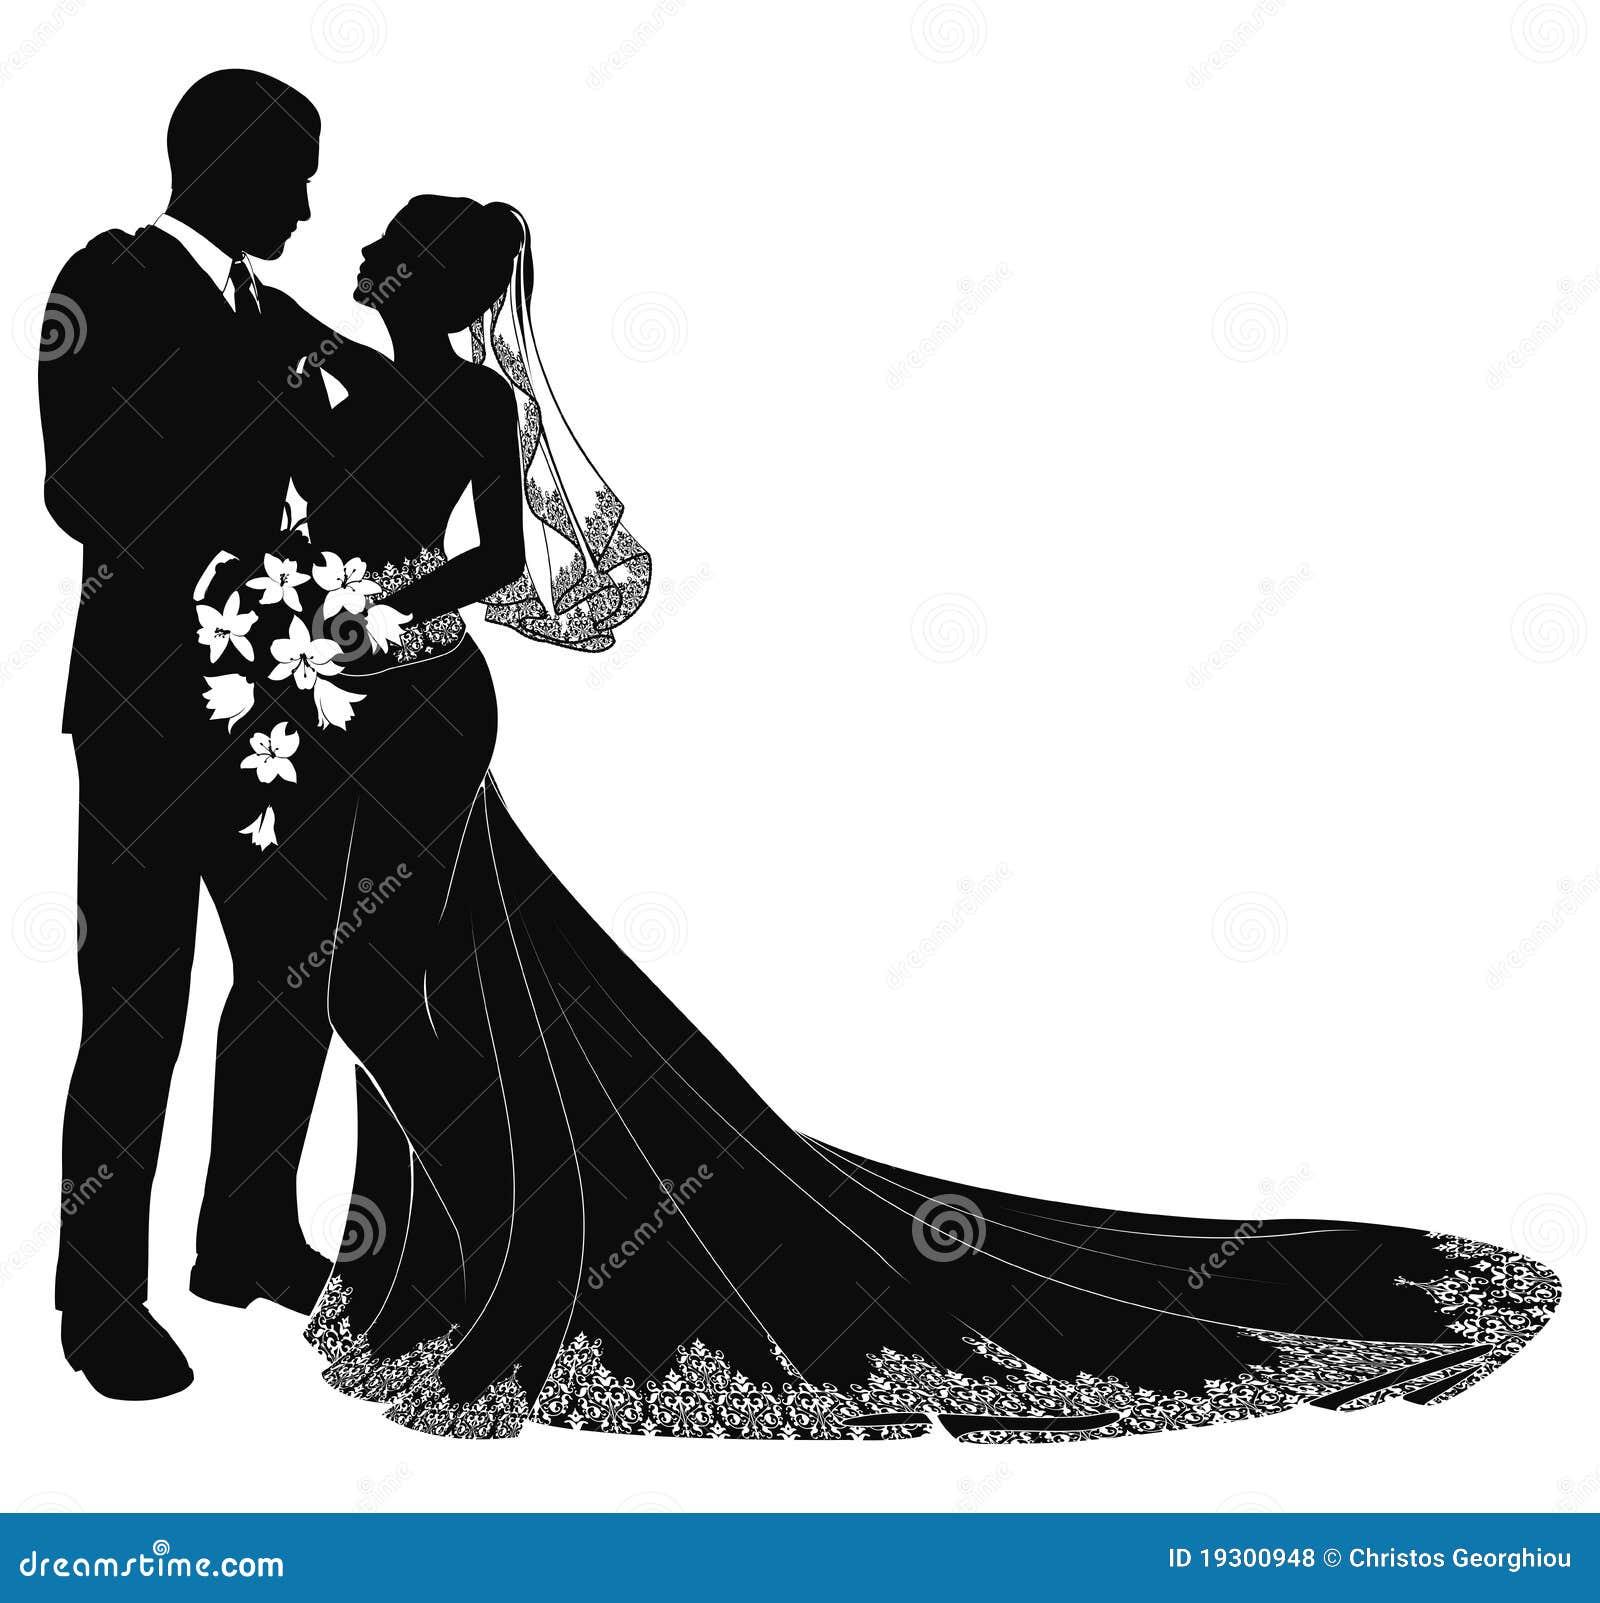 passo fundo single catholic girls Catholic single women in harrisville axtell catholic singles moody black dating site  grass valley single christian girls derry catholic women dating site.